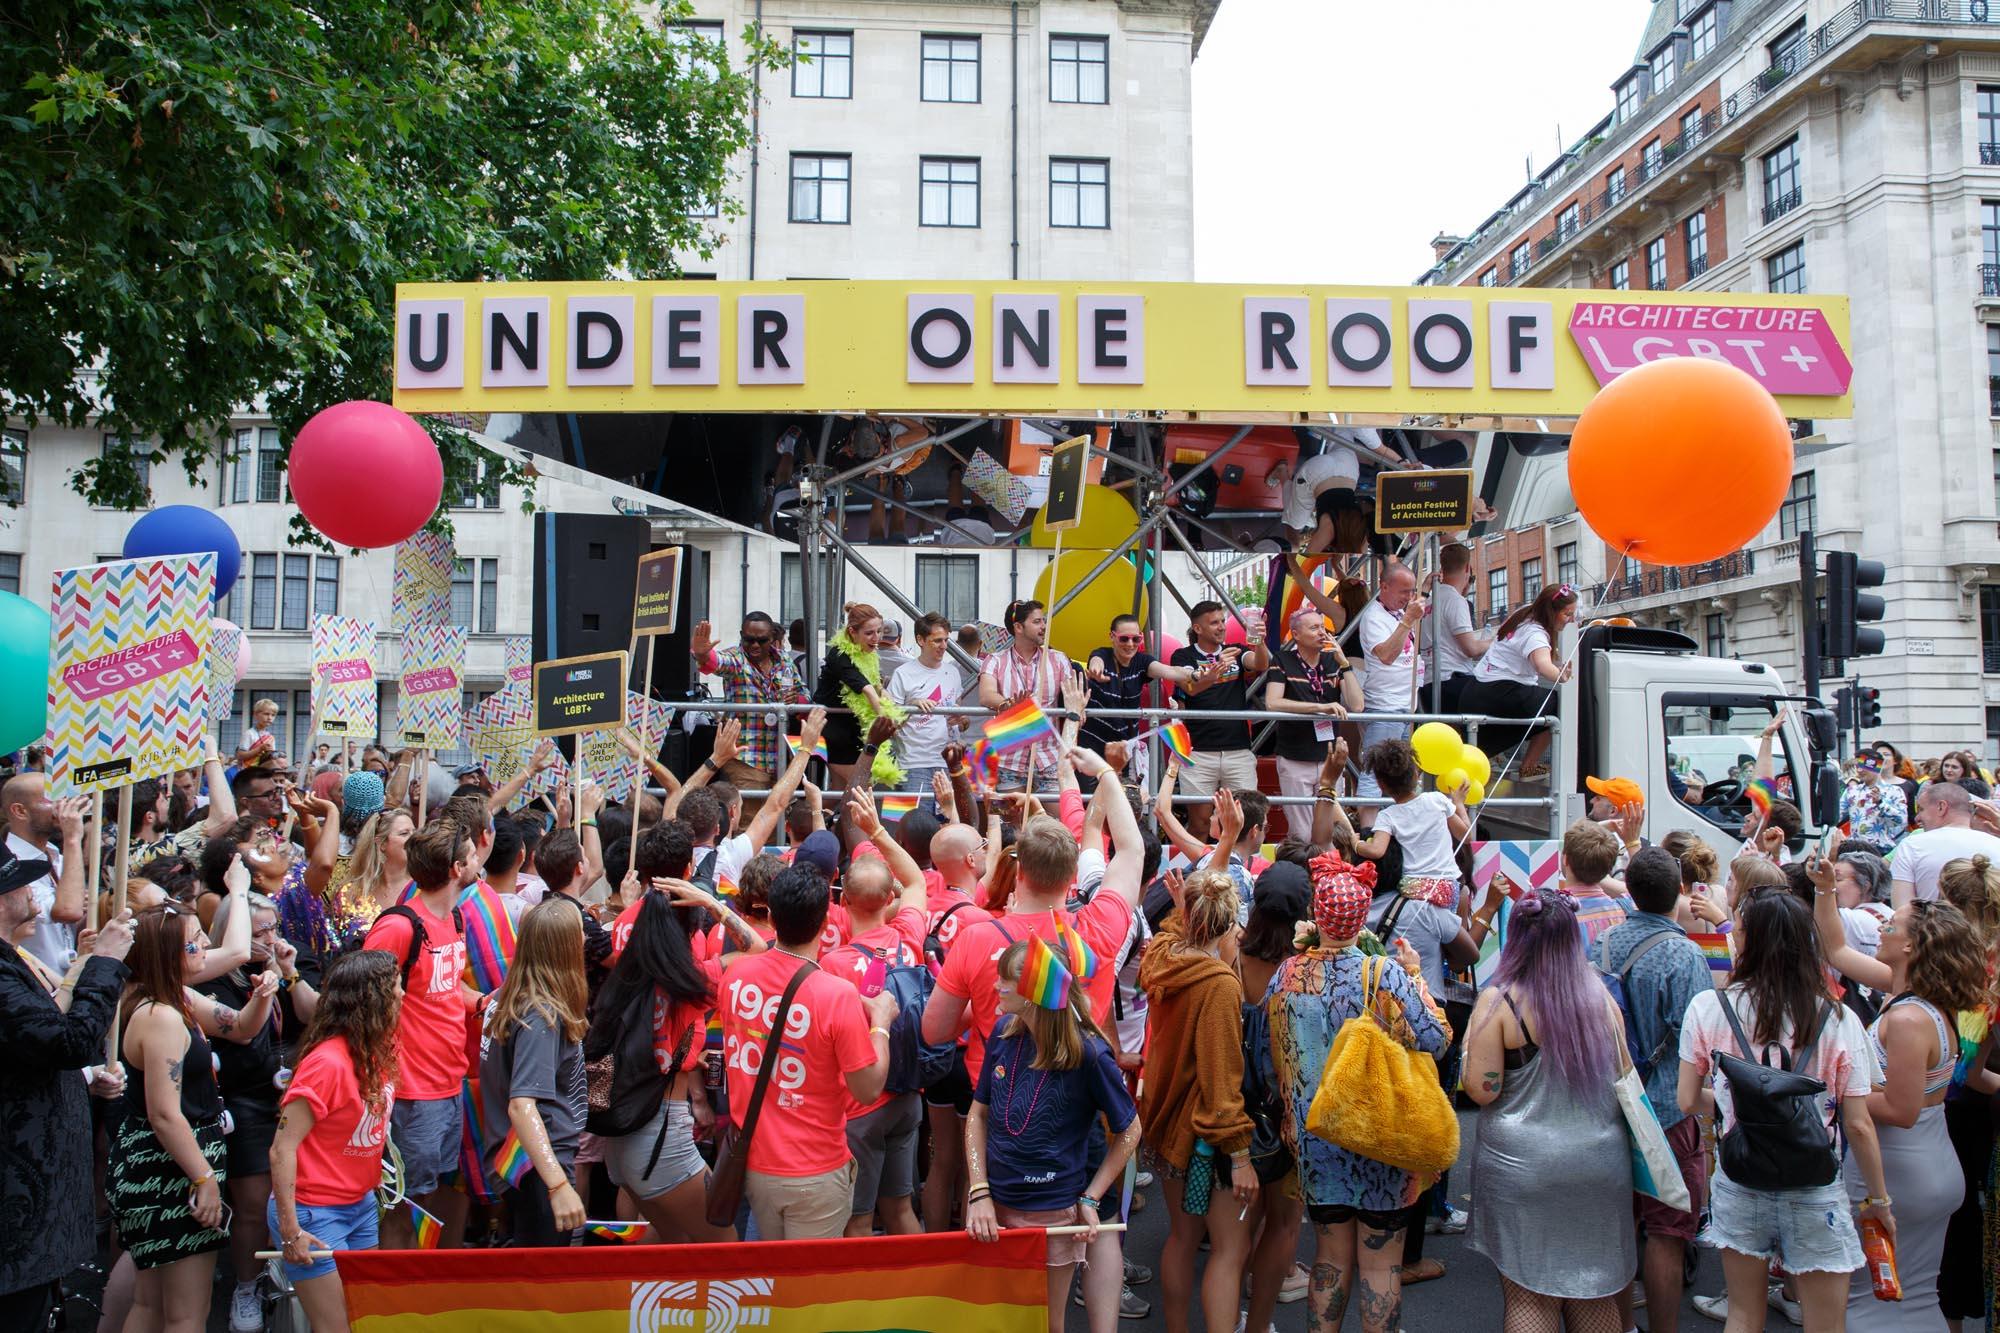 Architecture LGBT+ Pride 2019 pic Luke O'Donovan (8 of 23).jpg